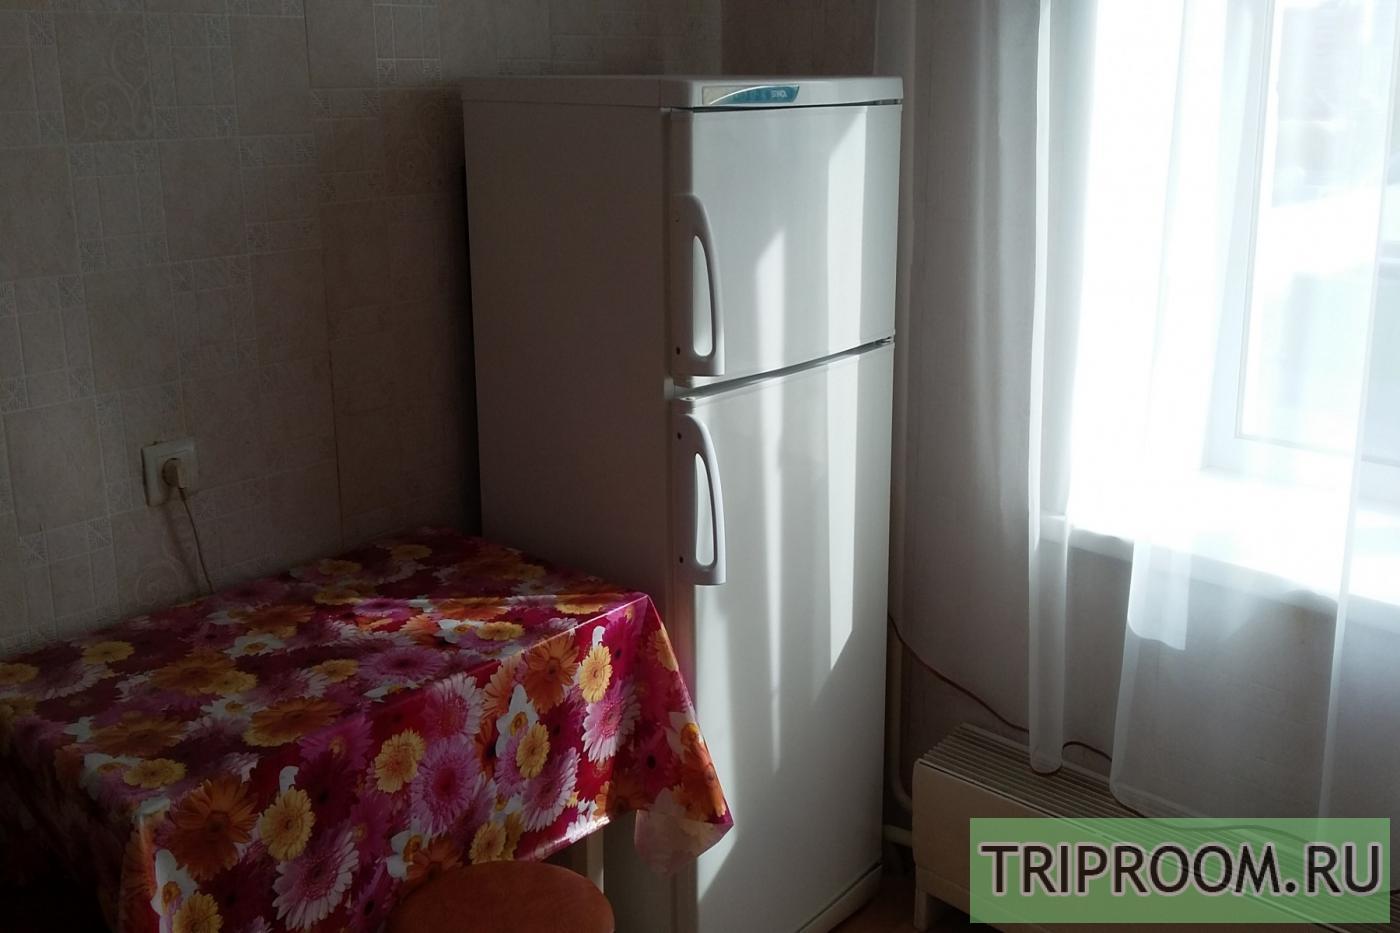 1-комнатная квартира посуточно (вариант № 29586), ул. Максима Горького улица, фото № 7